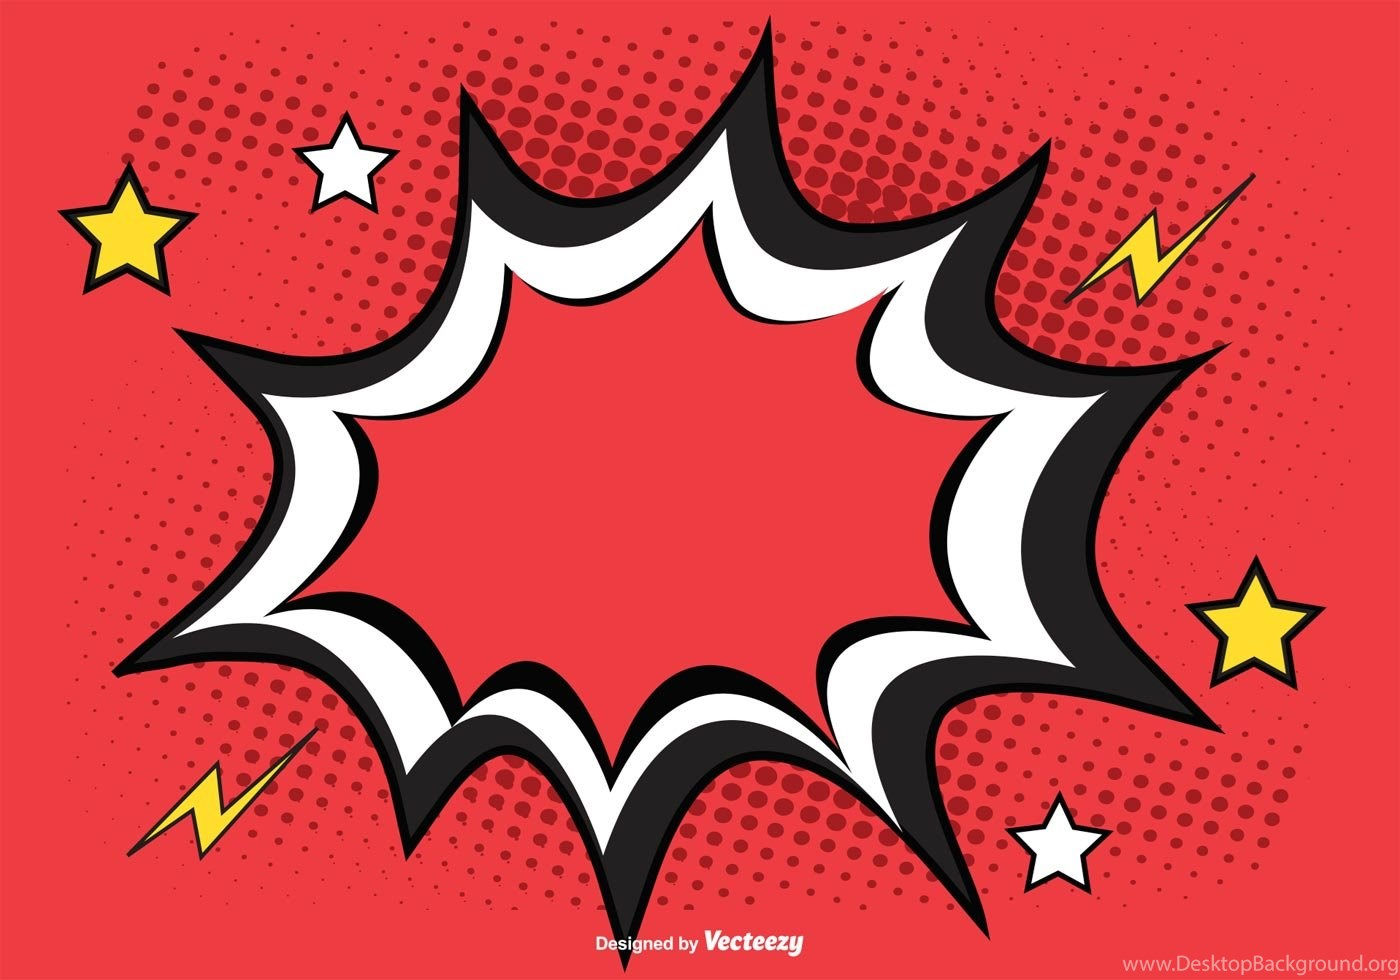 1400x980 Comic Burst Free Vector Art (1797 Free Downloads) Desktop Background